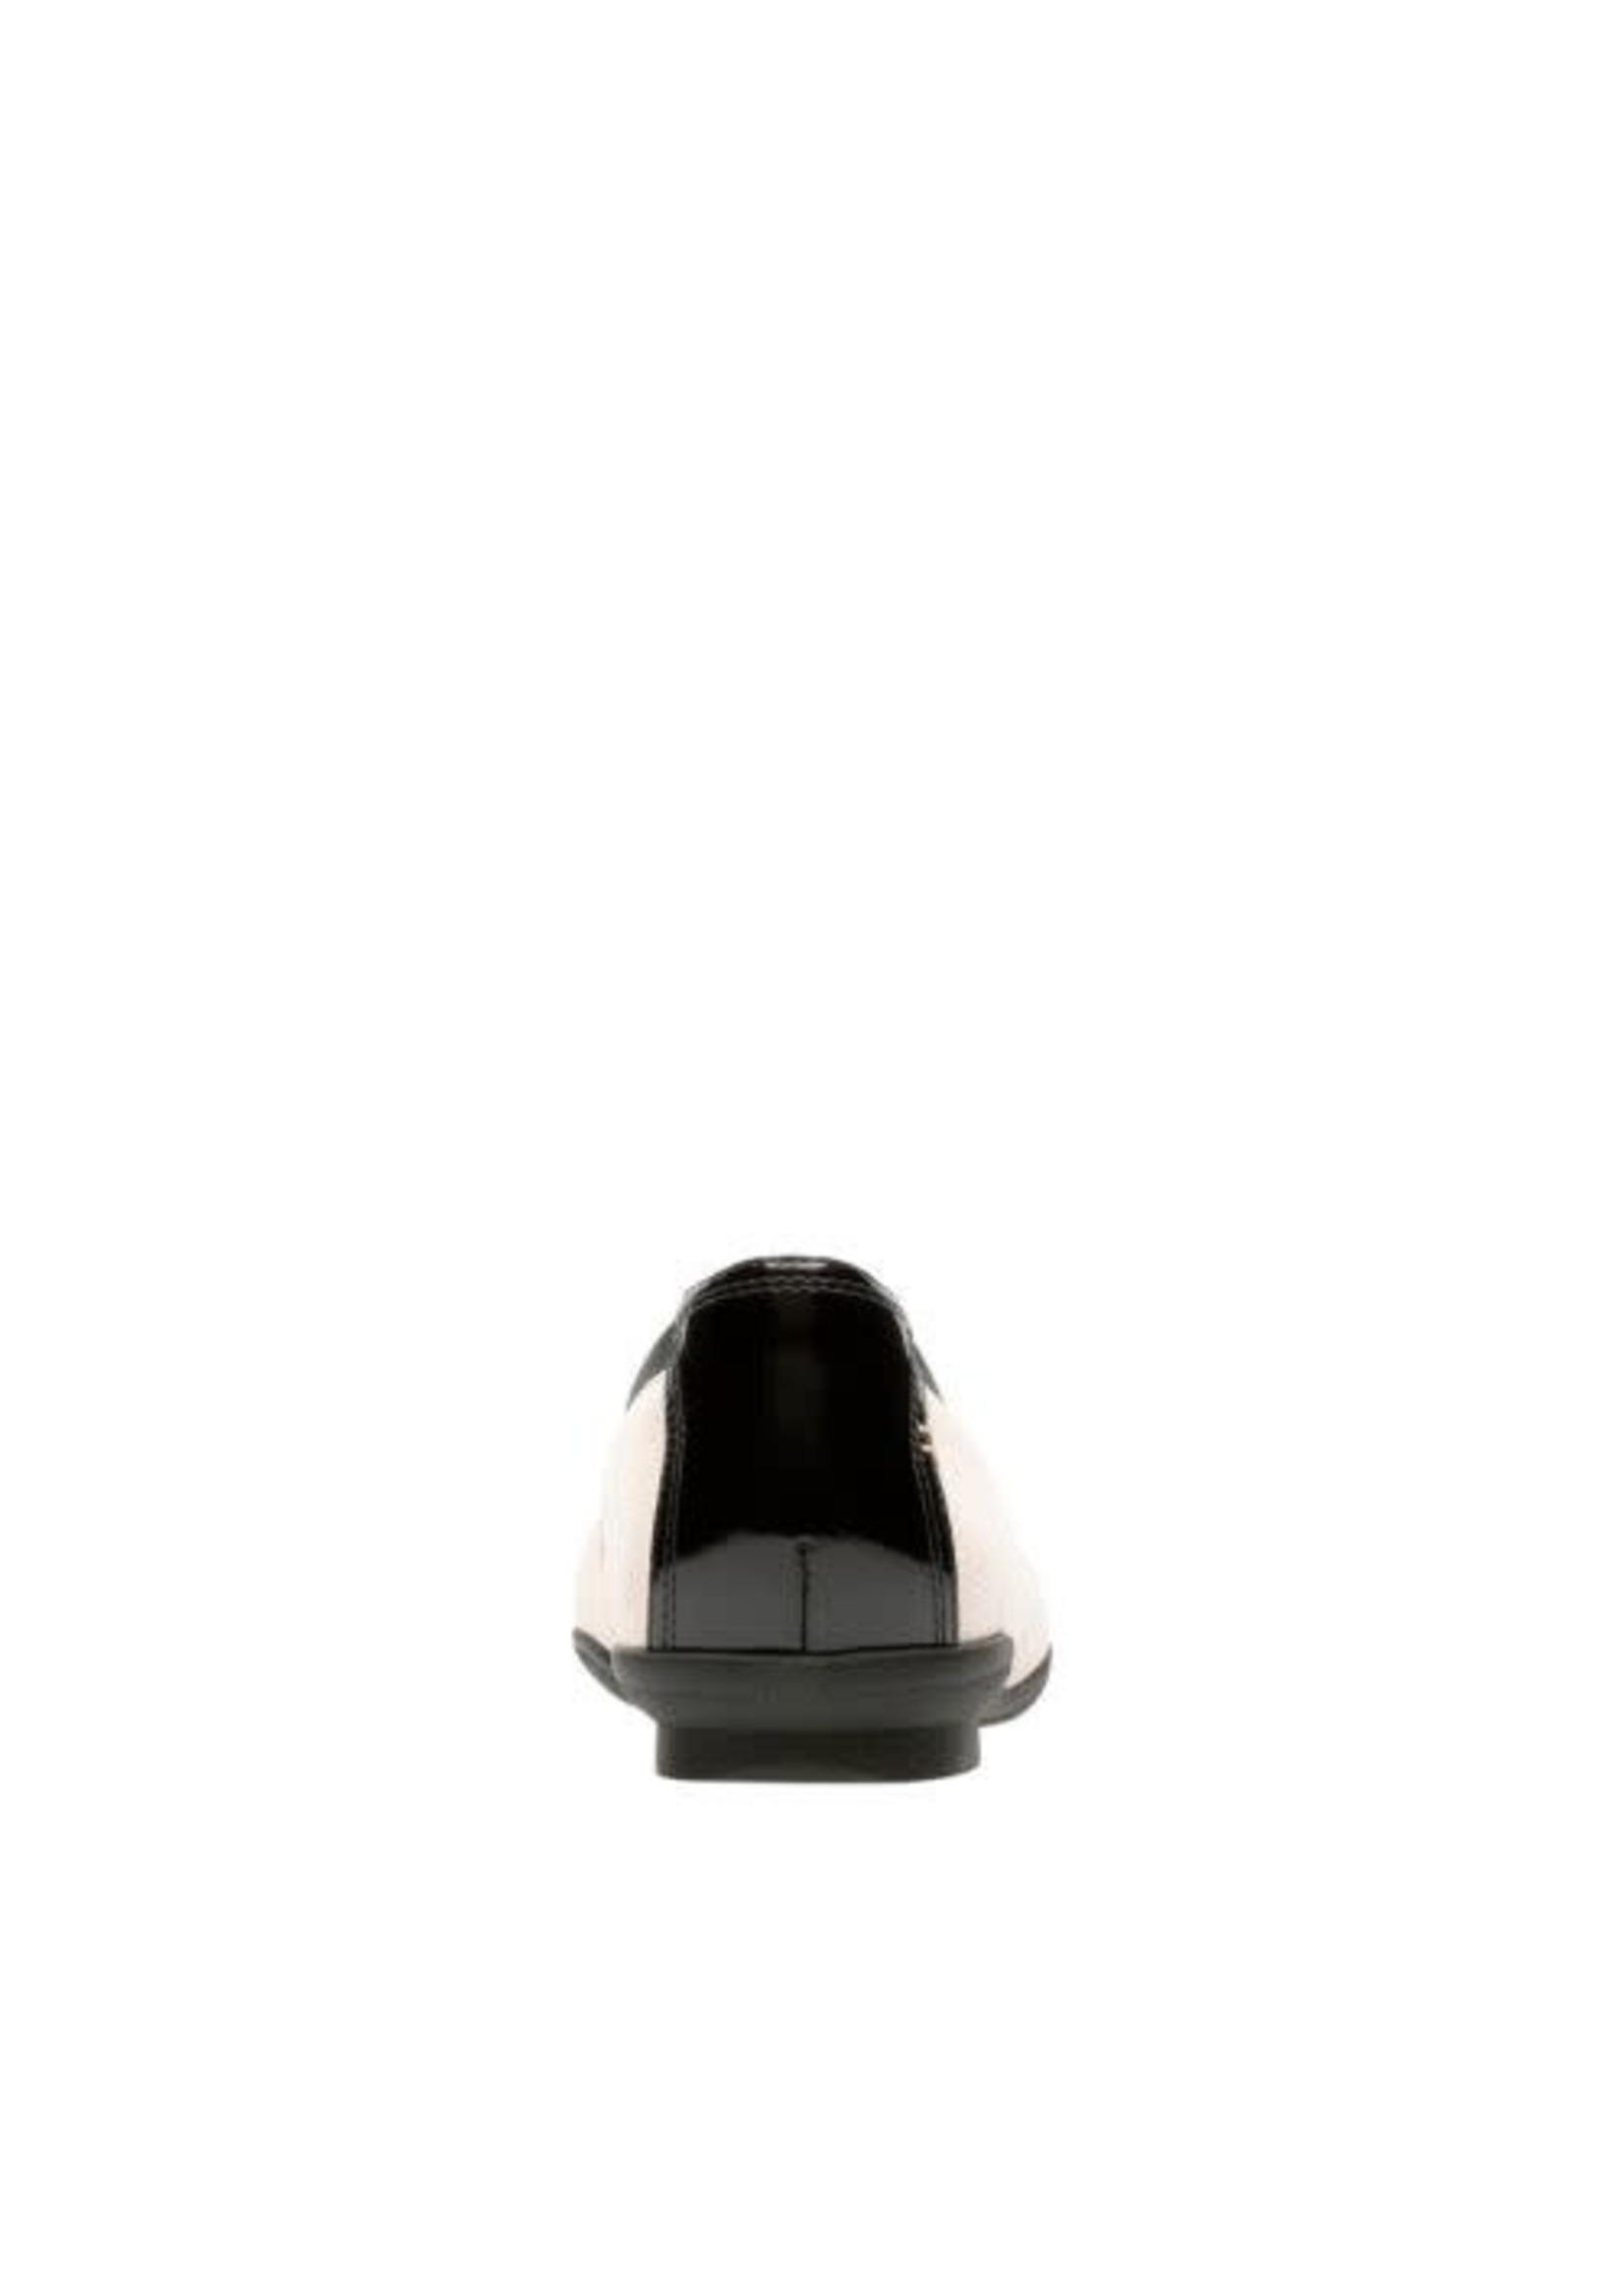 CLARKS CLARKS- NEENAH GARDEN- NUDE NUBUCK/ BLACK PATENT LEATHER COMBI